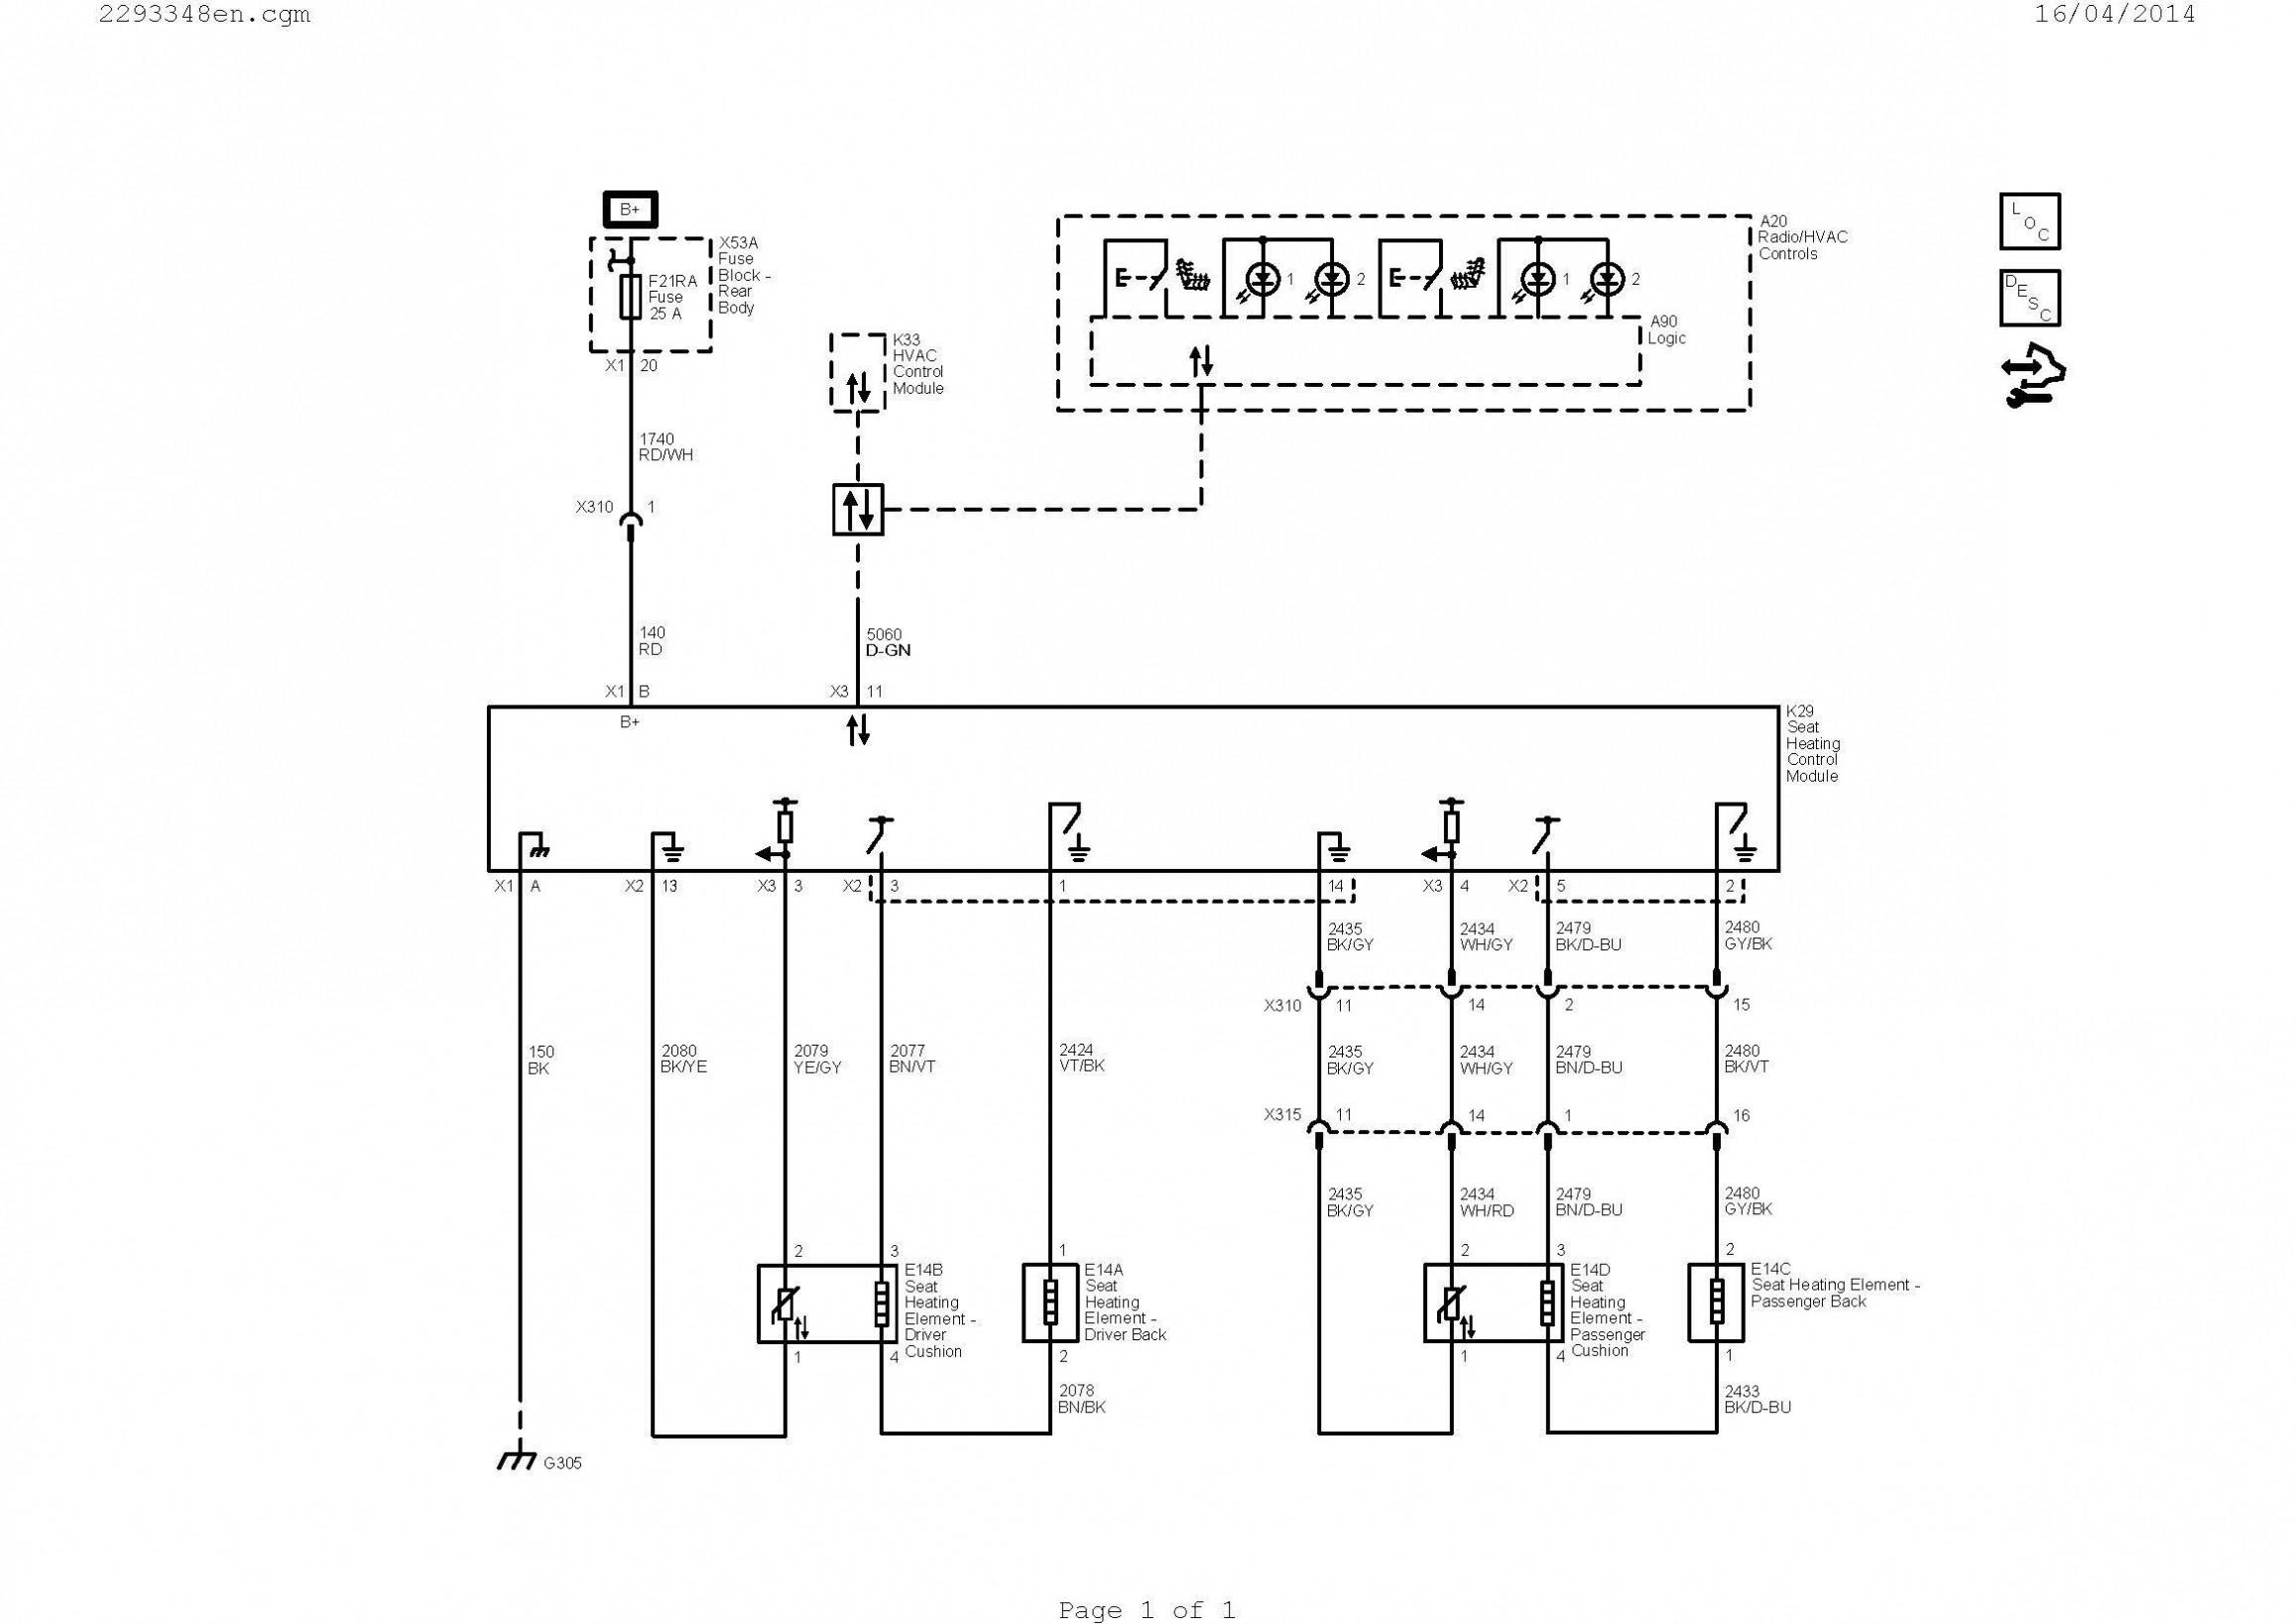 Freightliner Air System Diagram Air Conditioner Wiring Diagram Freightliner Ac Blower Motor Of Freightliner Air System Diagram